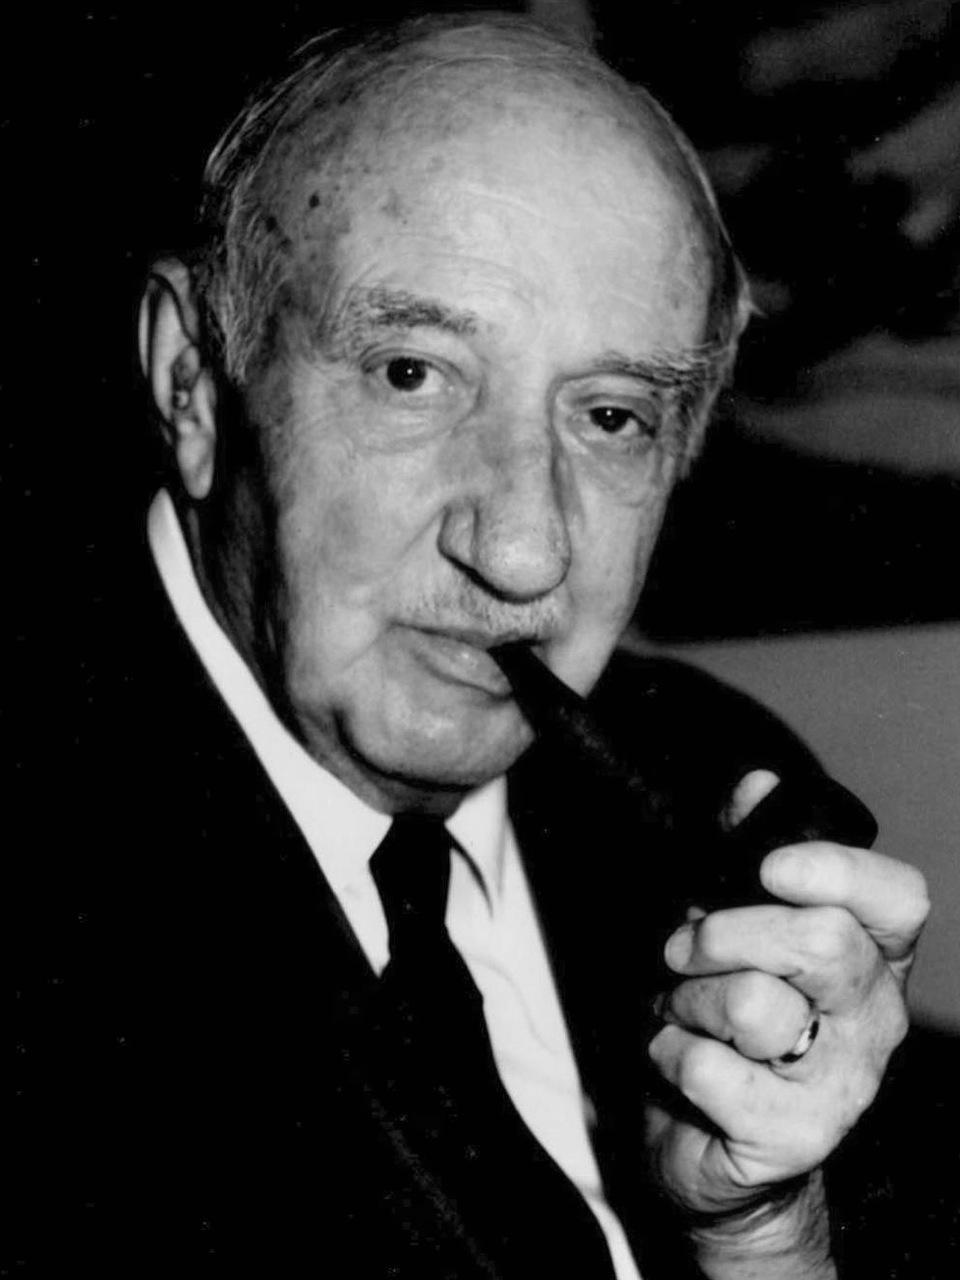 Douglas Tipper